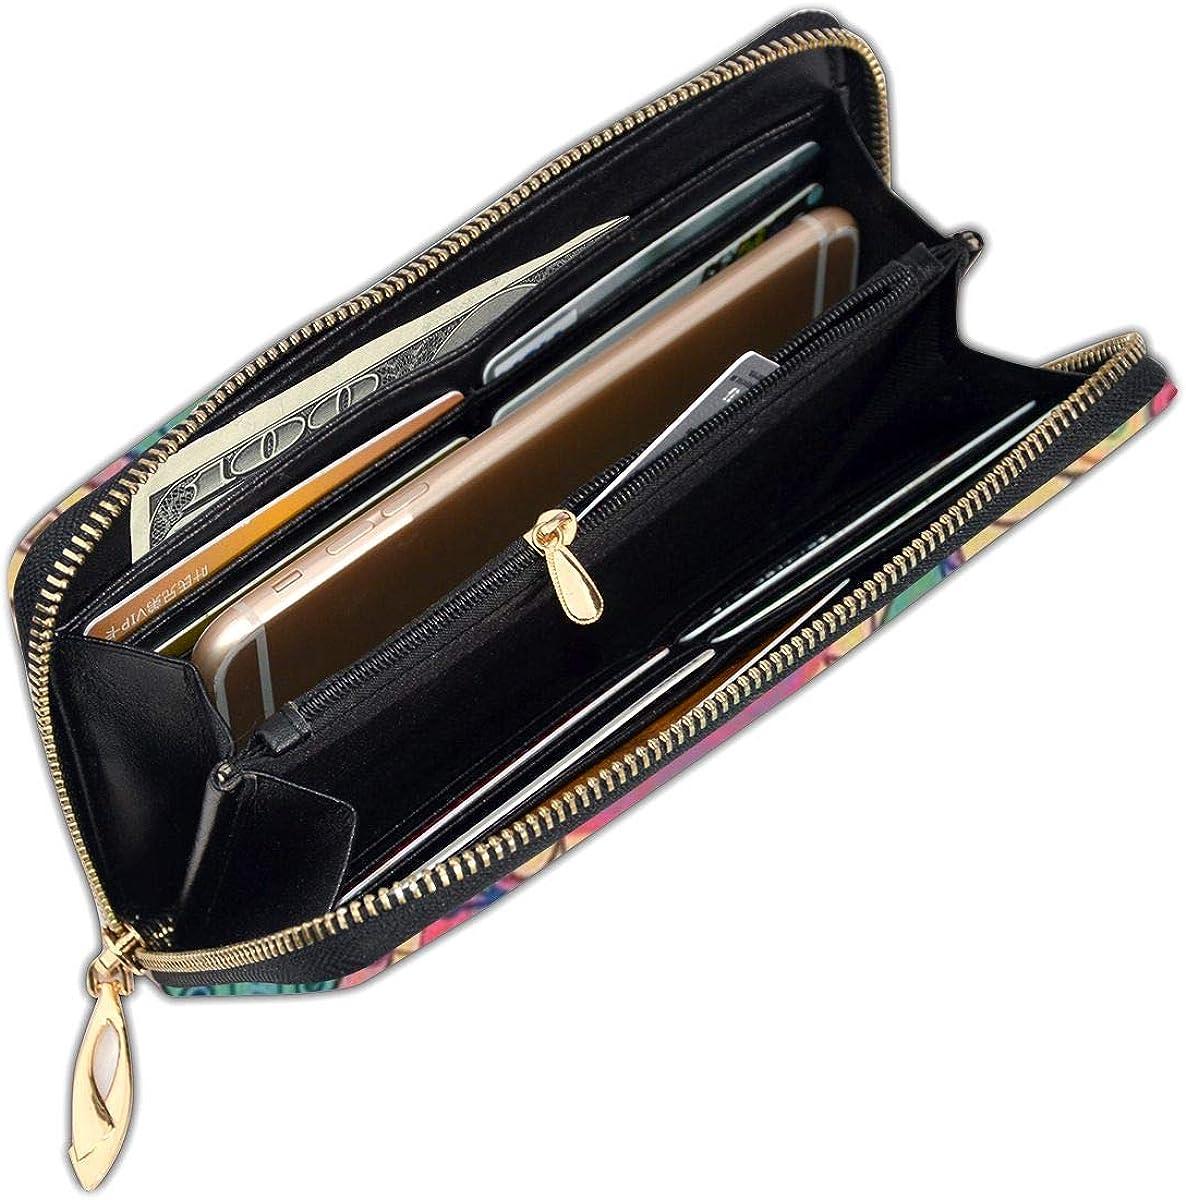 Kaleidoscope Color Womens RFID Blocking Zip Around Wallet Genuine Leather Clutch Long Card Holder Organizer Wallets Large Travel Purse